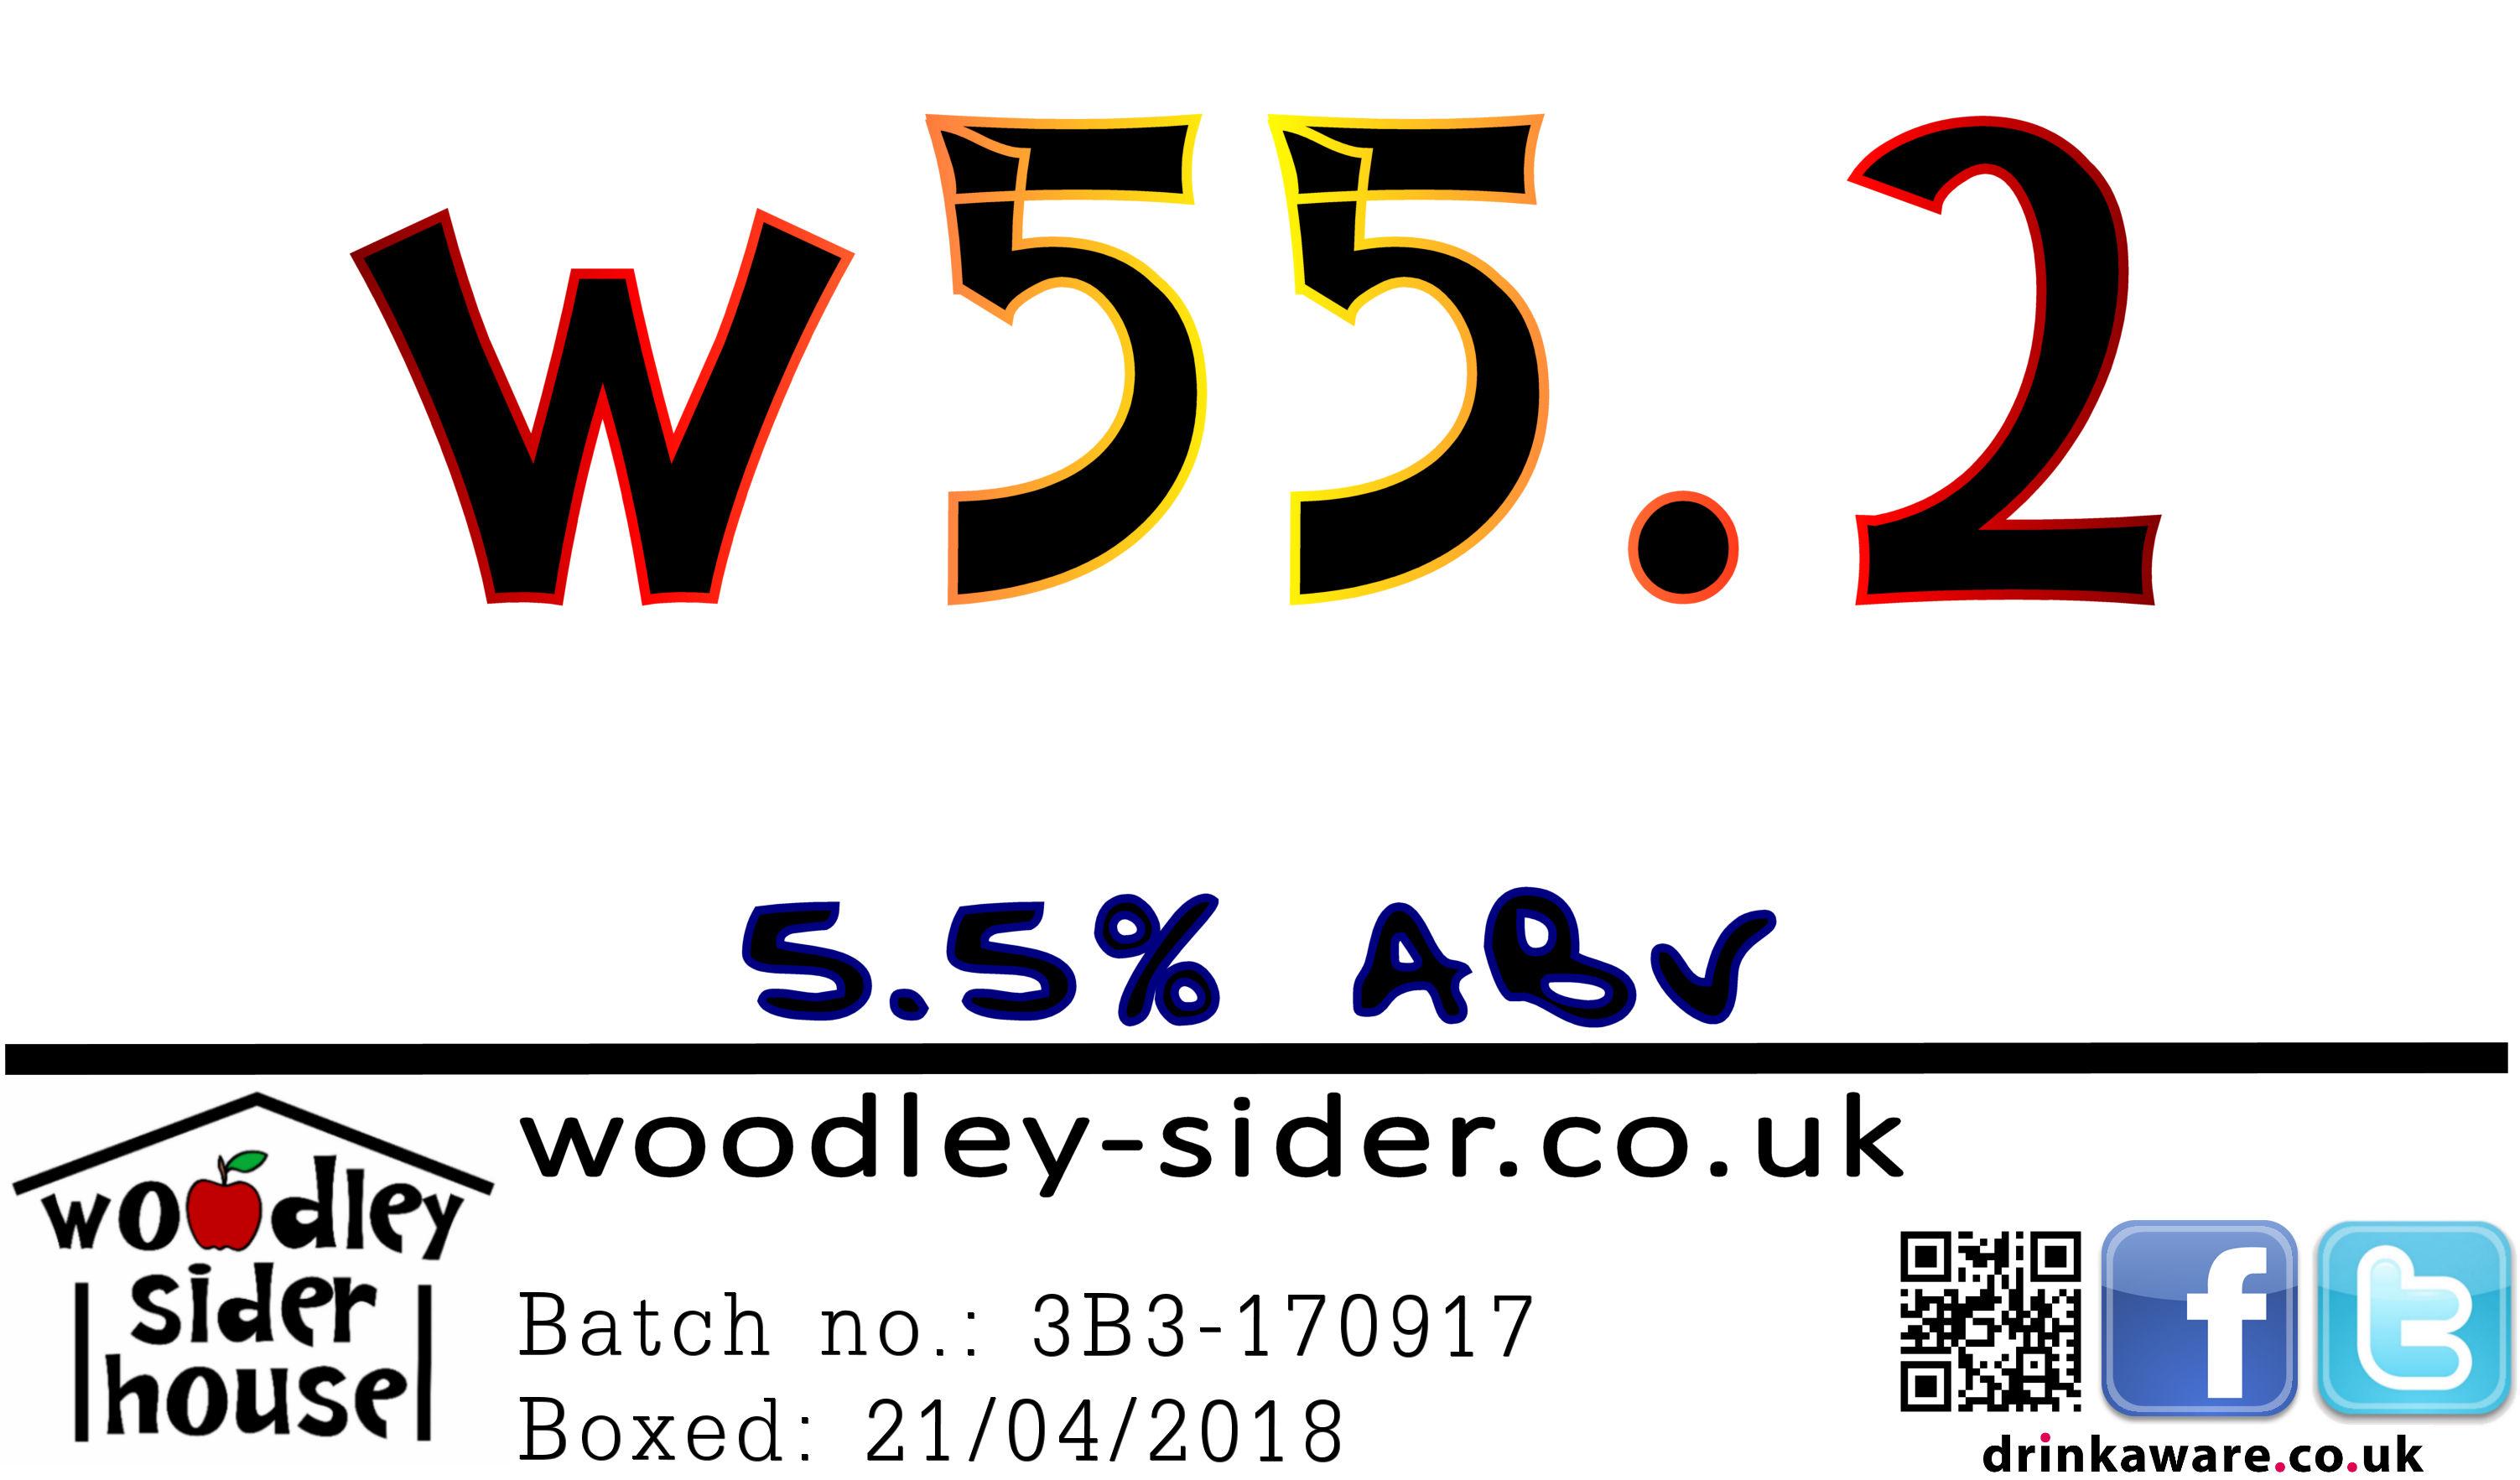 W55.2